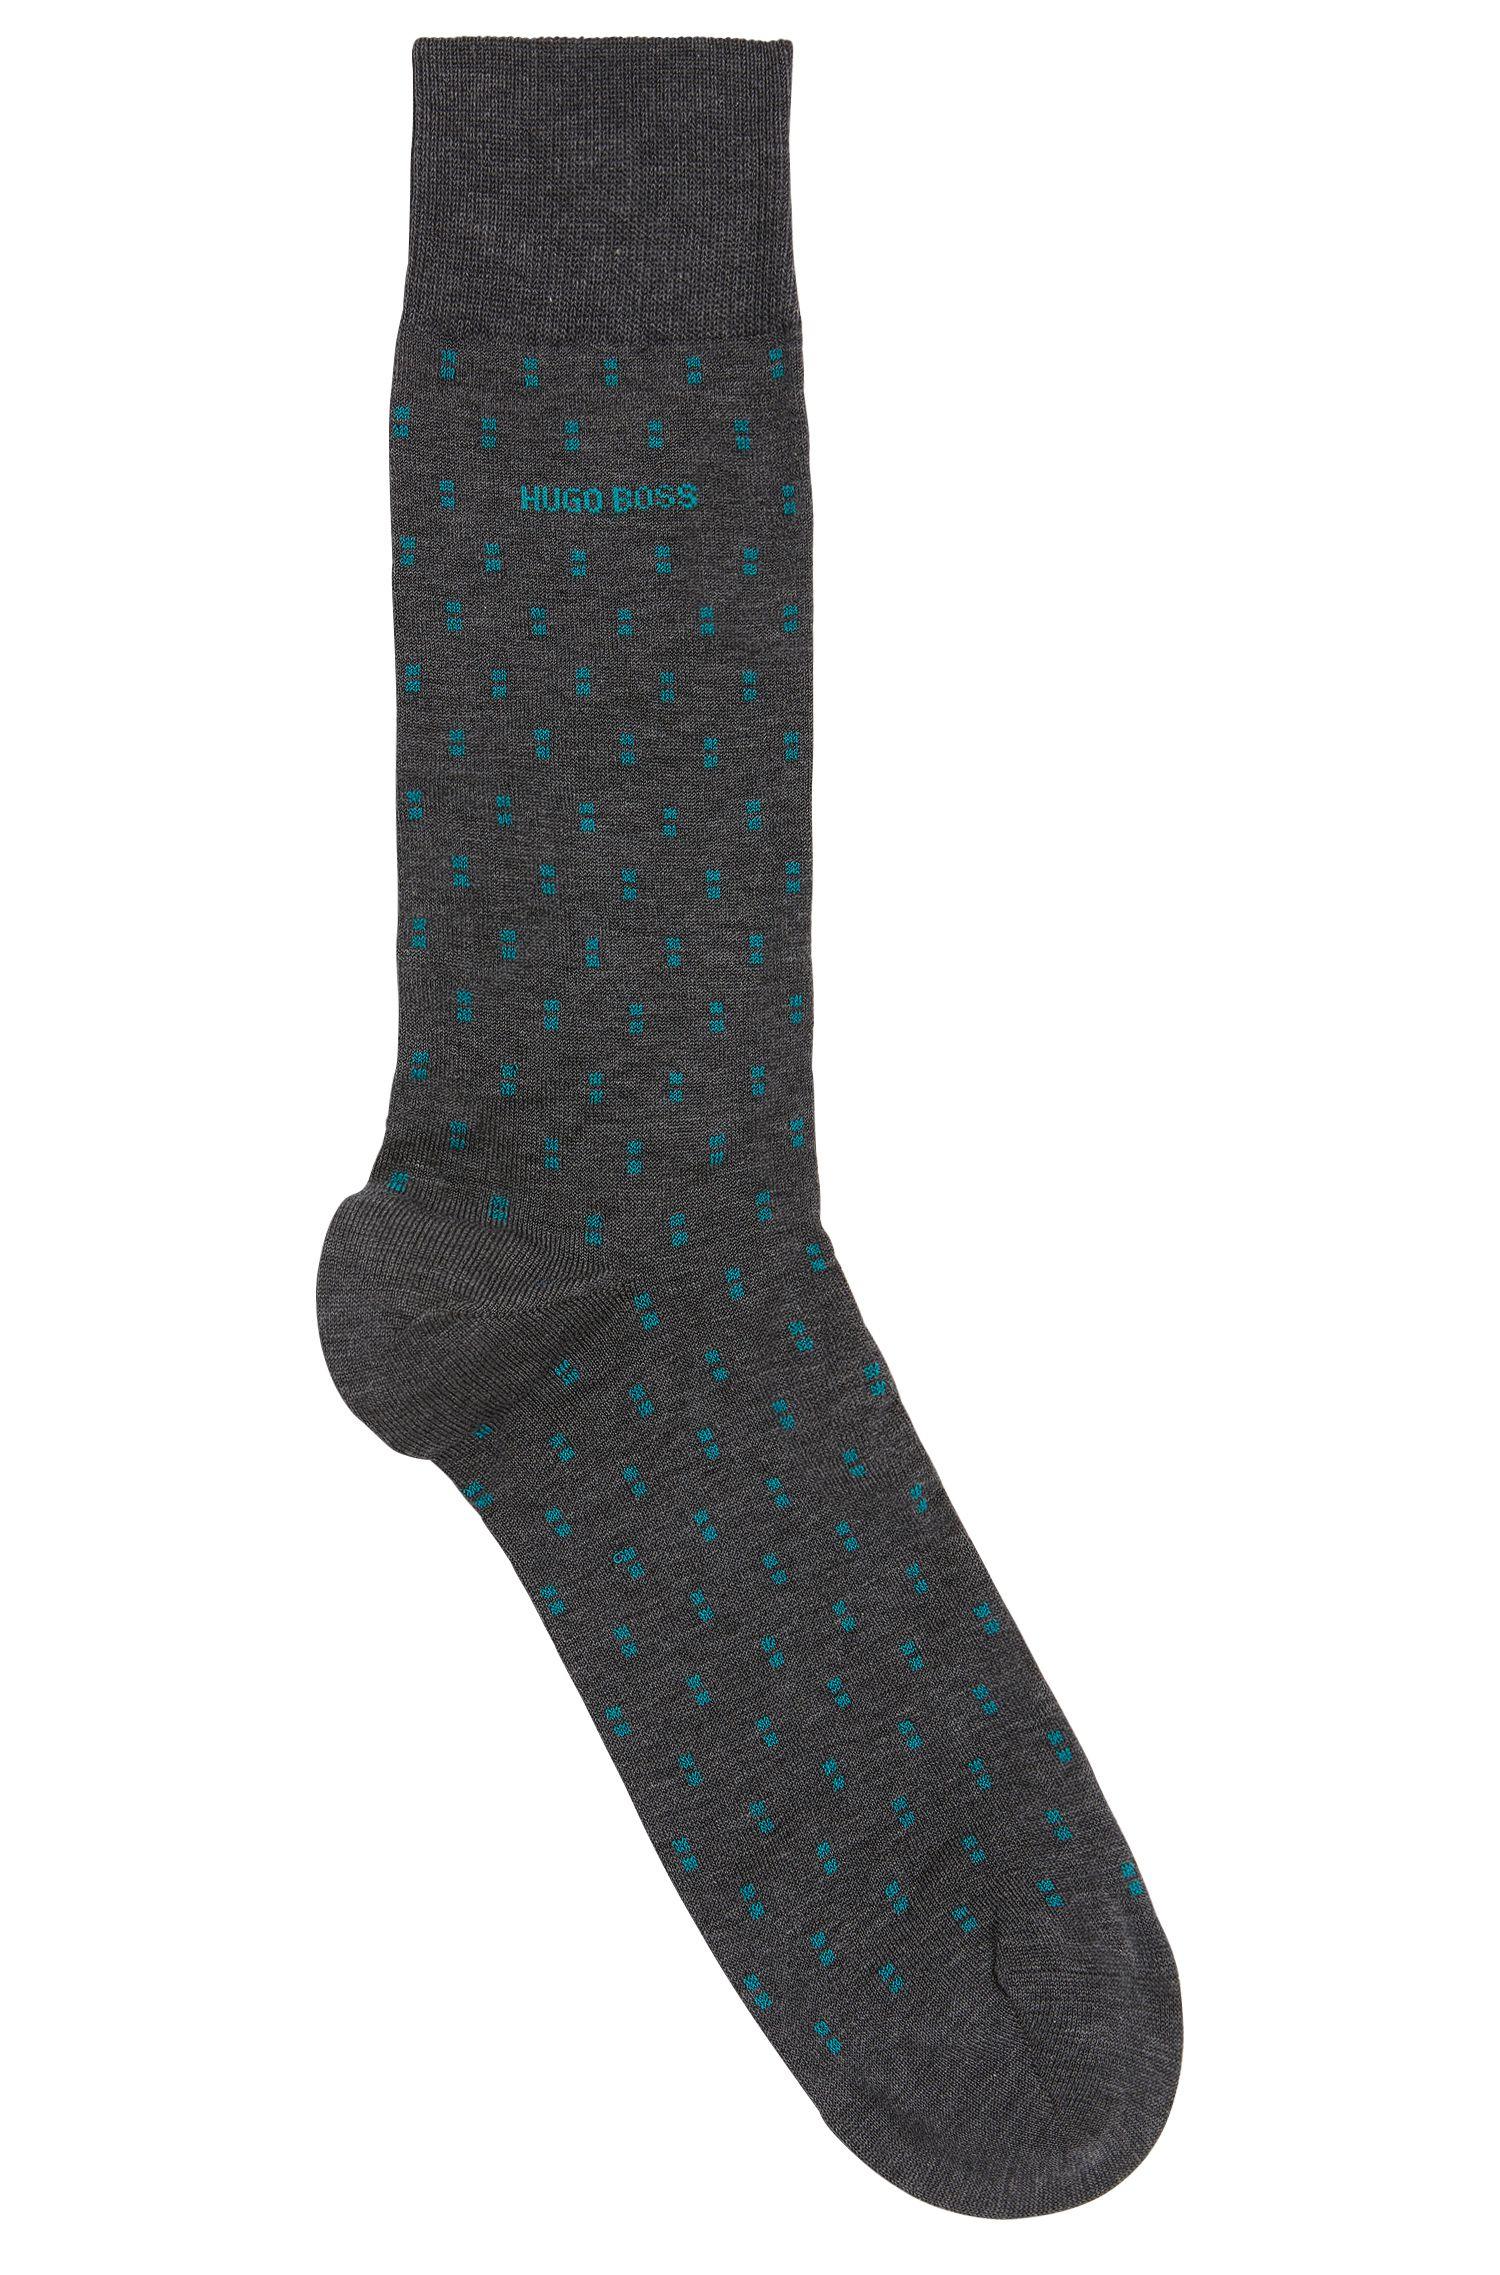 Dash Pattern Stretch Cotton Blend Sock | RS Design US